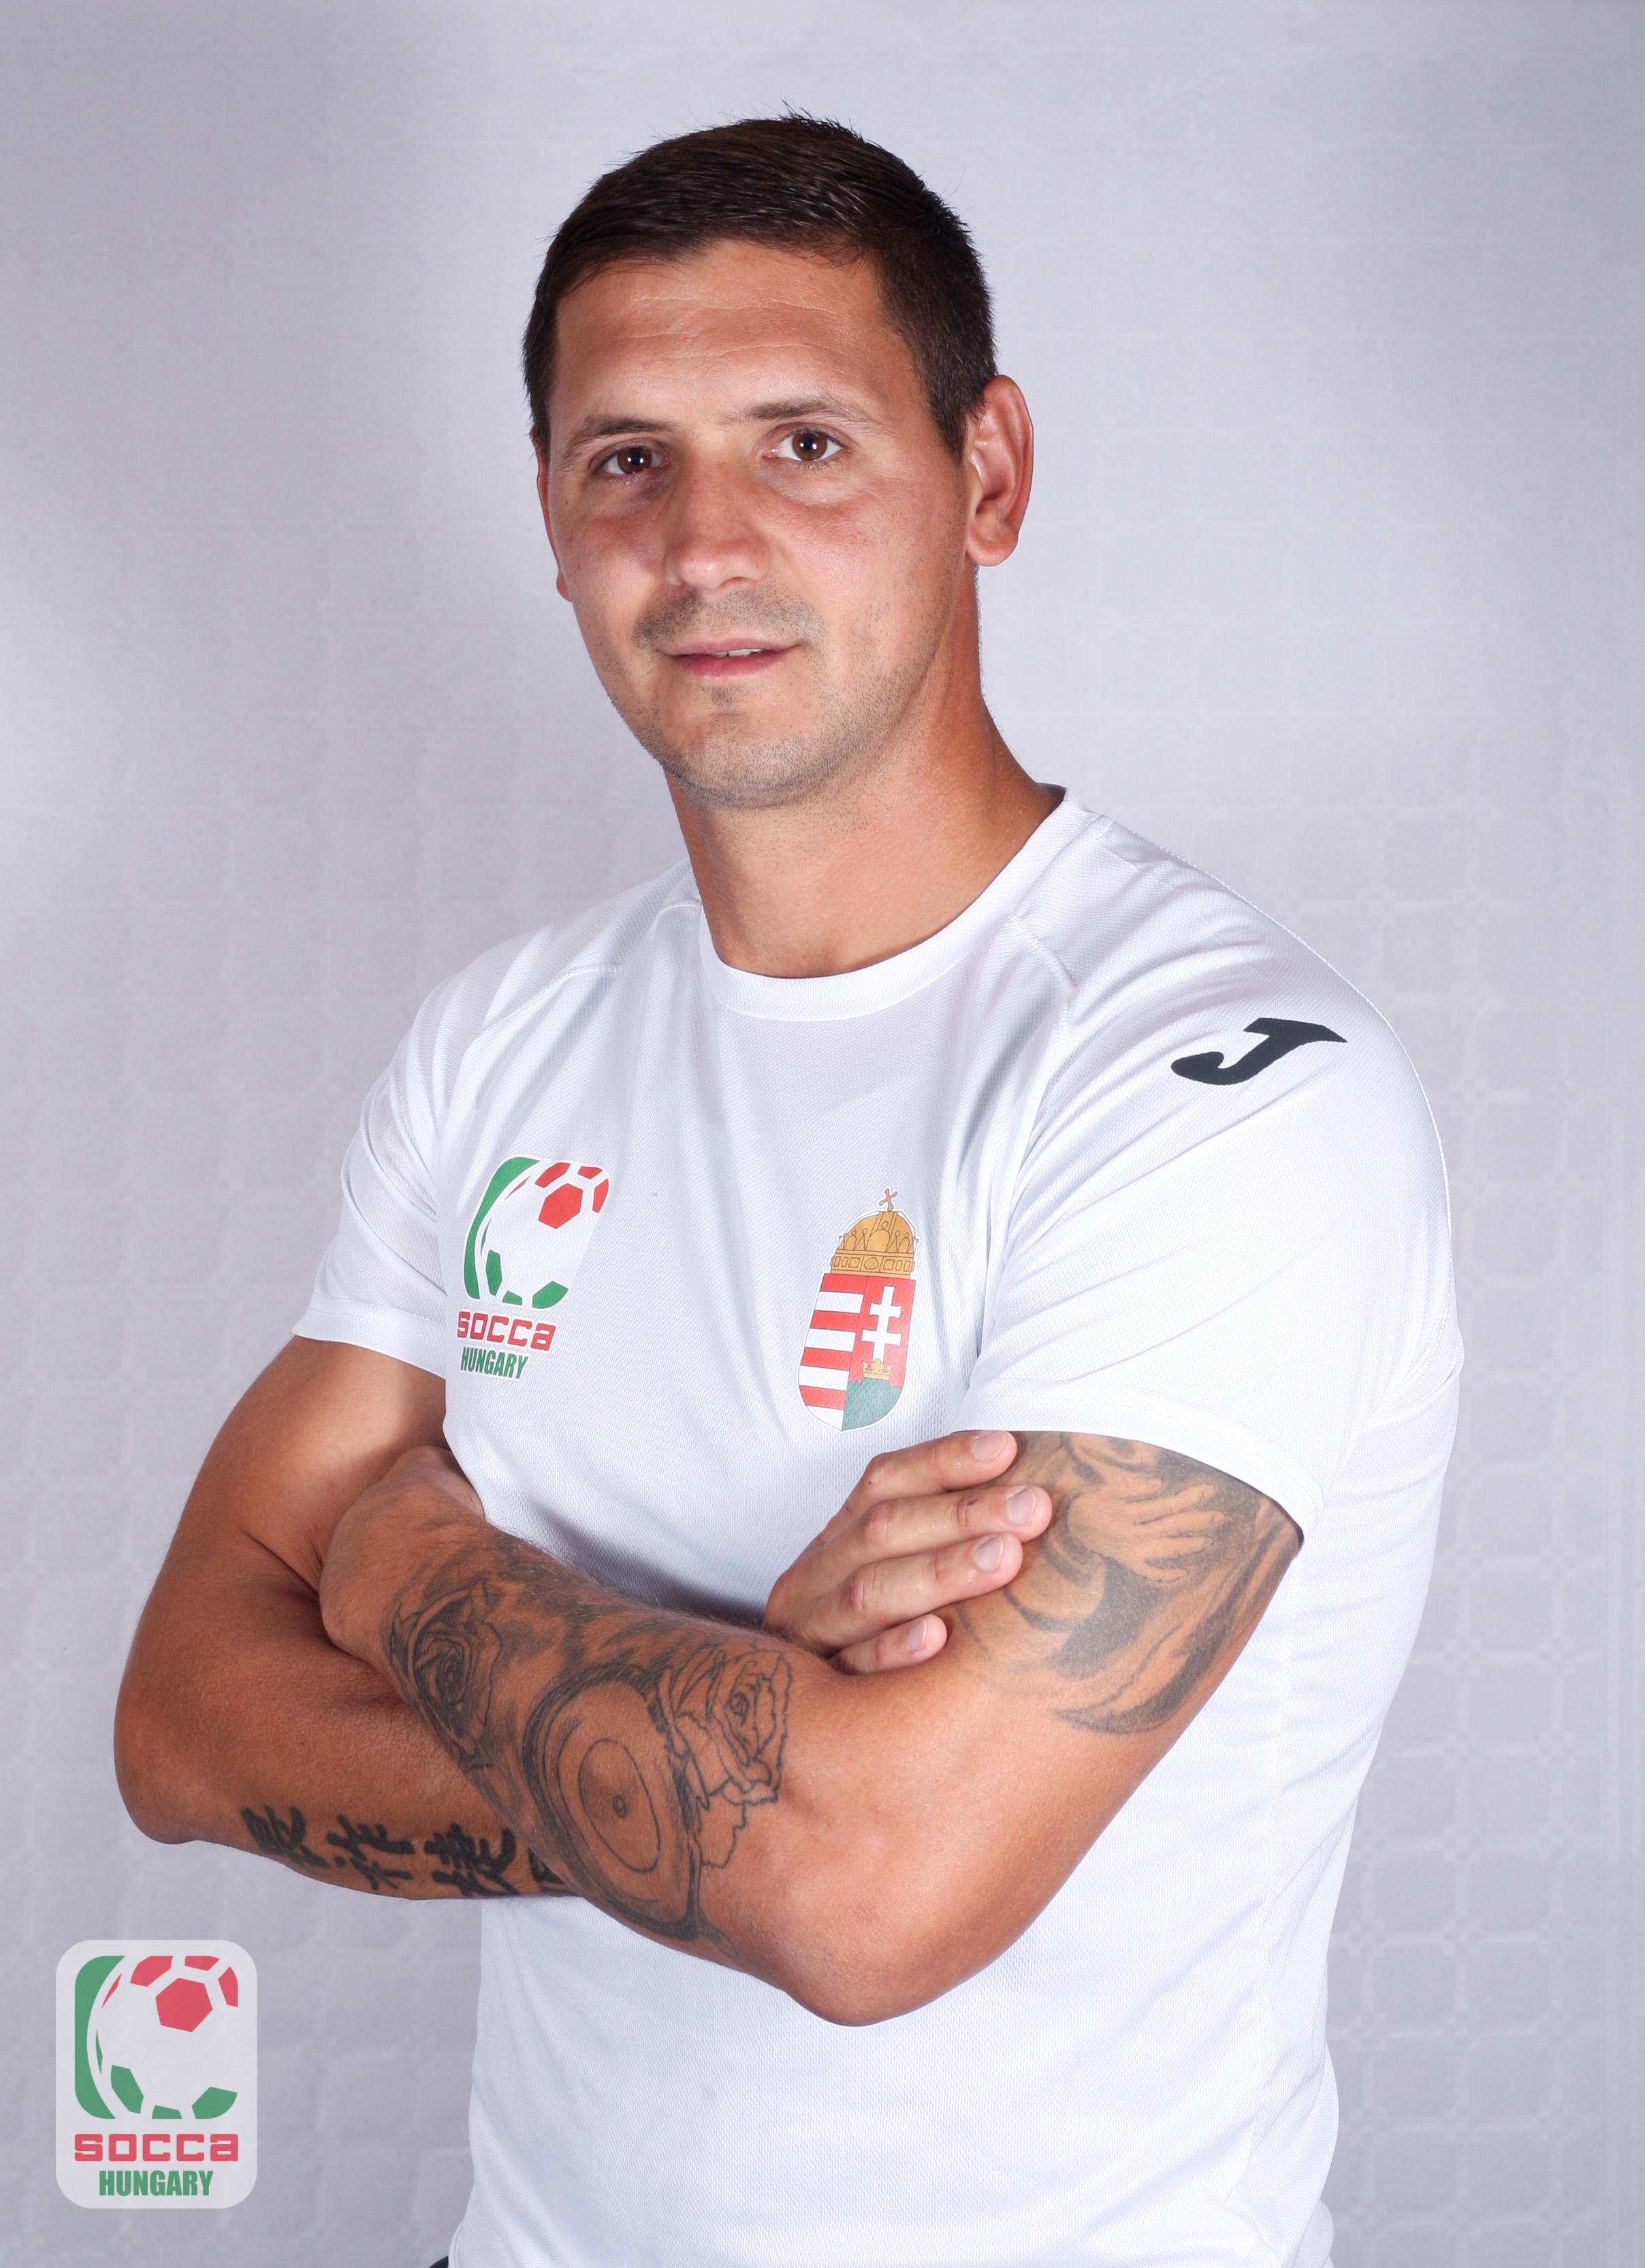 Tamás Hevesi-Tóth